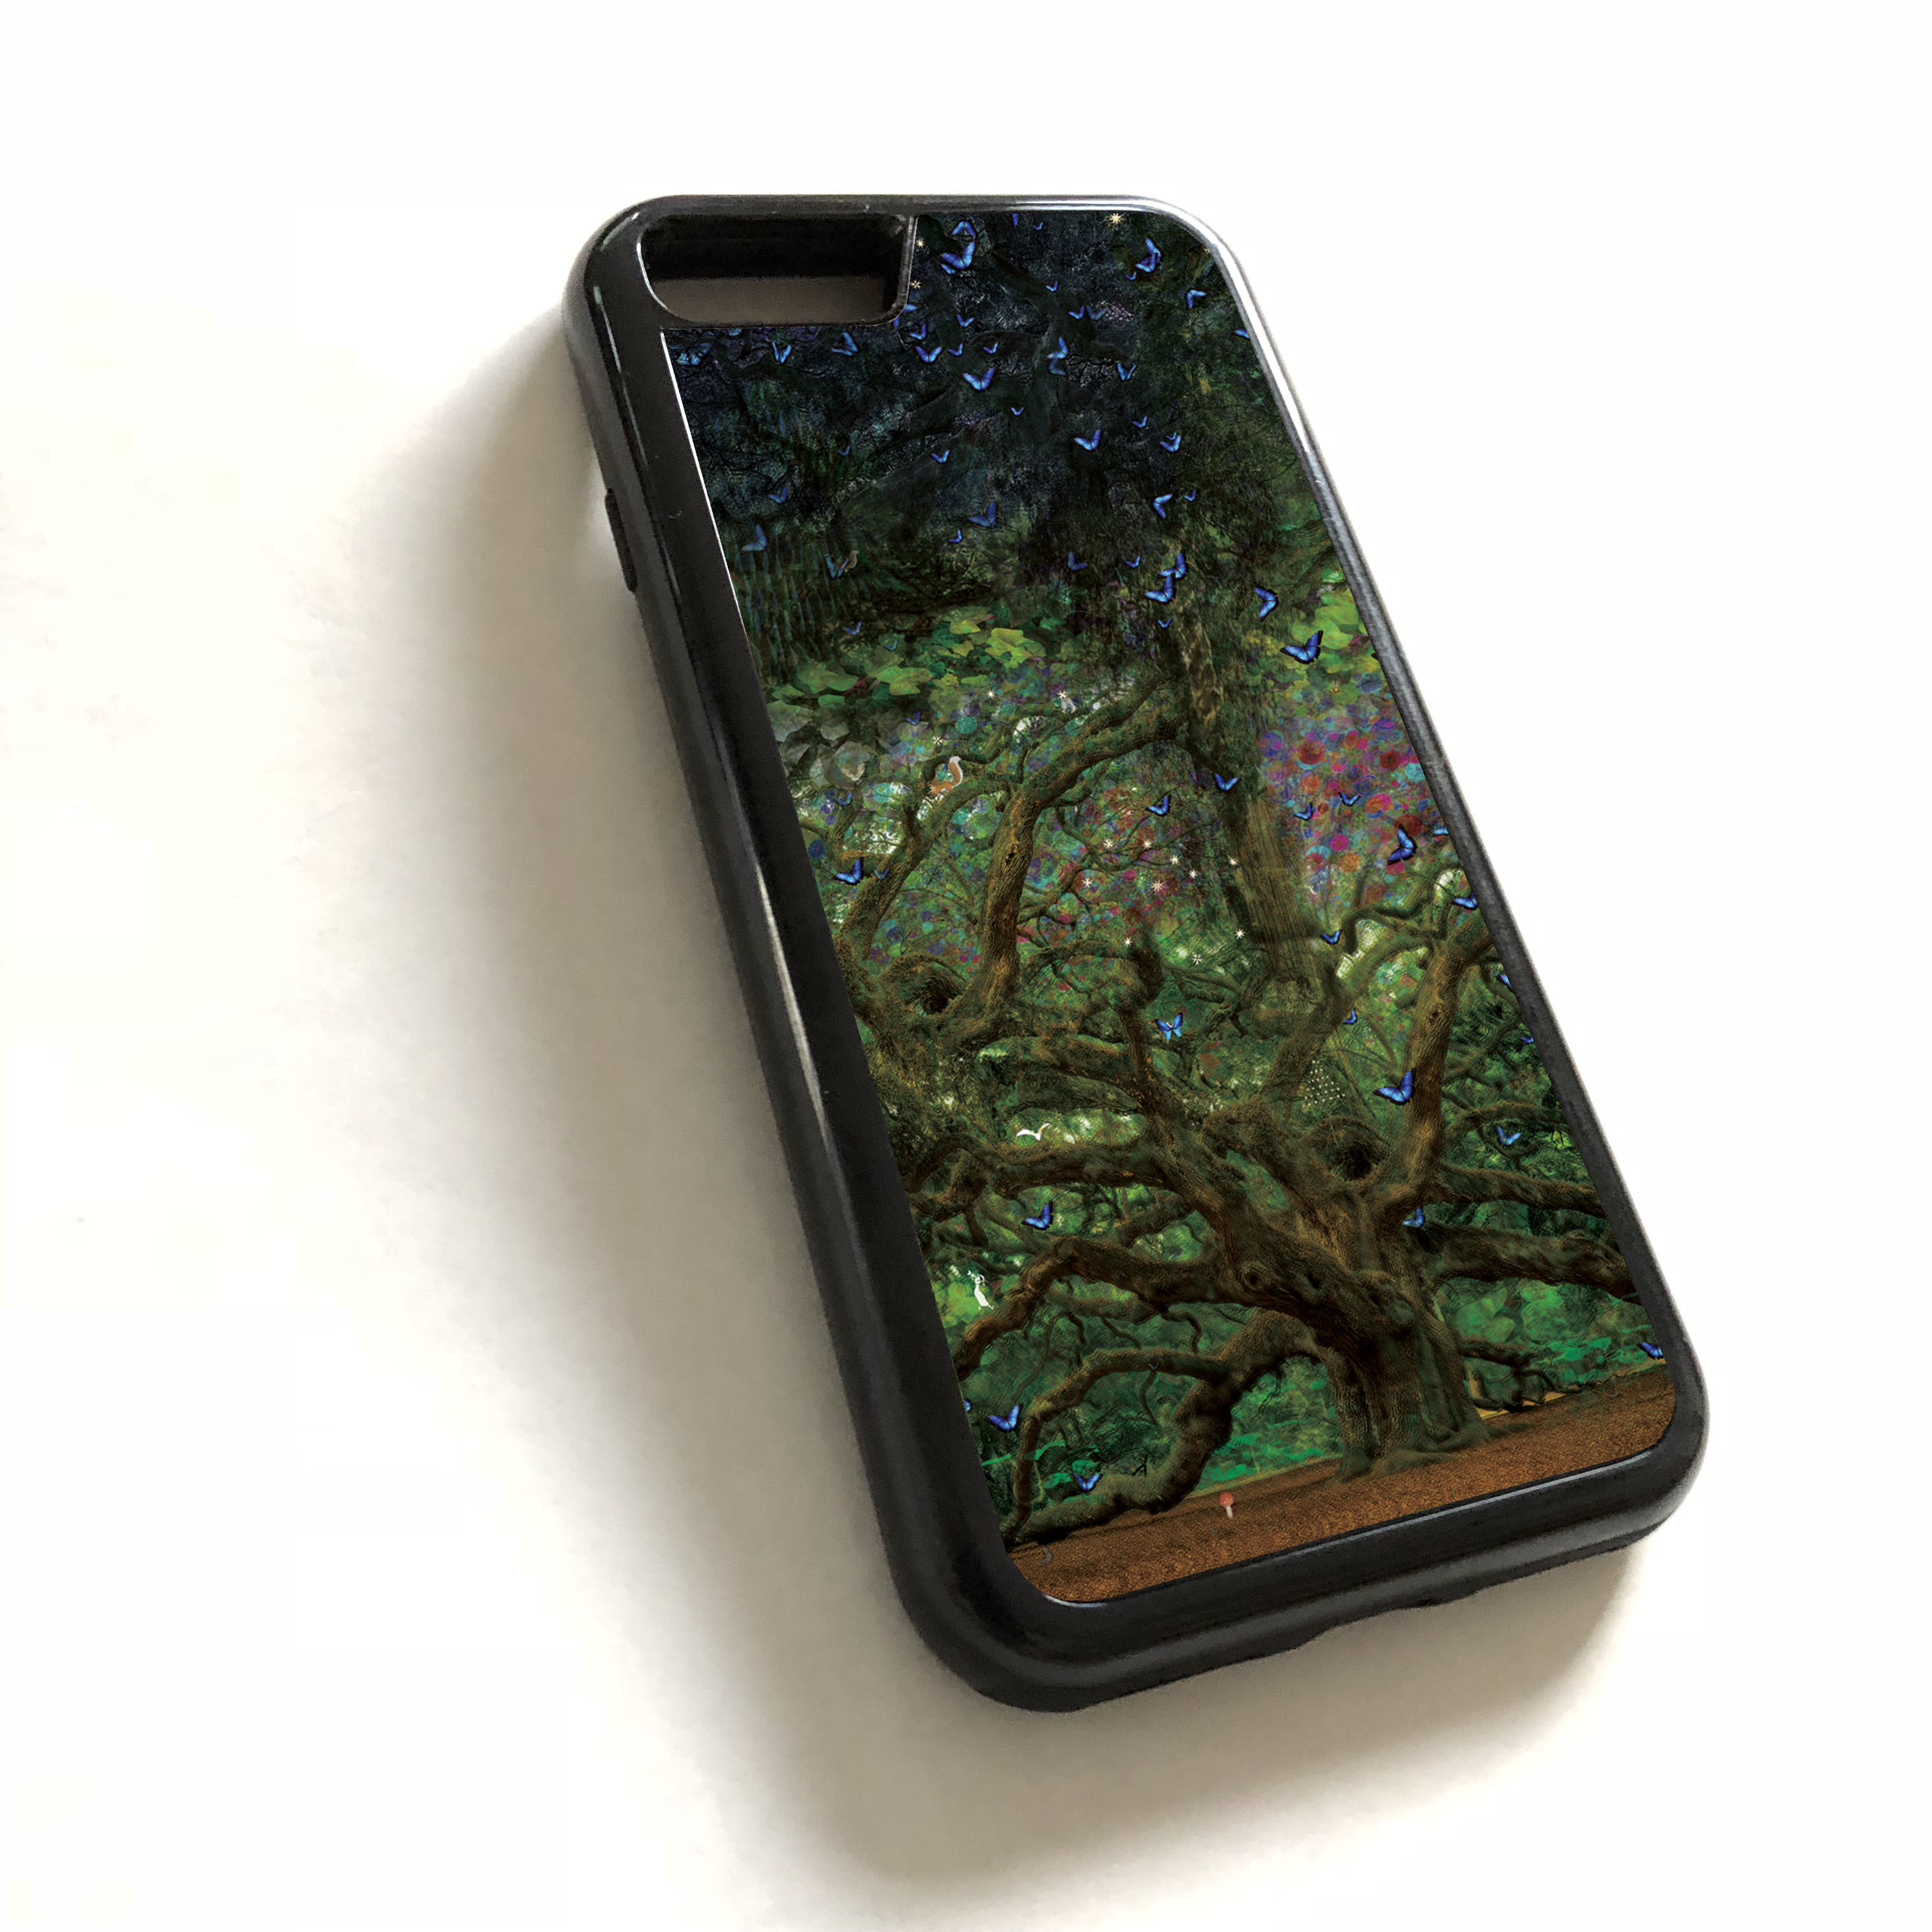 『sumika』 ハイブリットiPhoneケース  「完全オーダー商品」